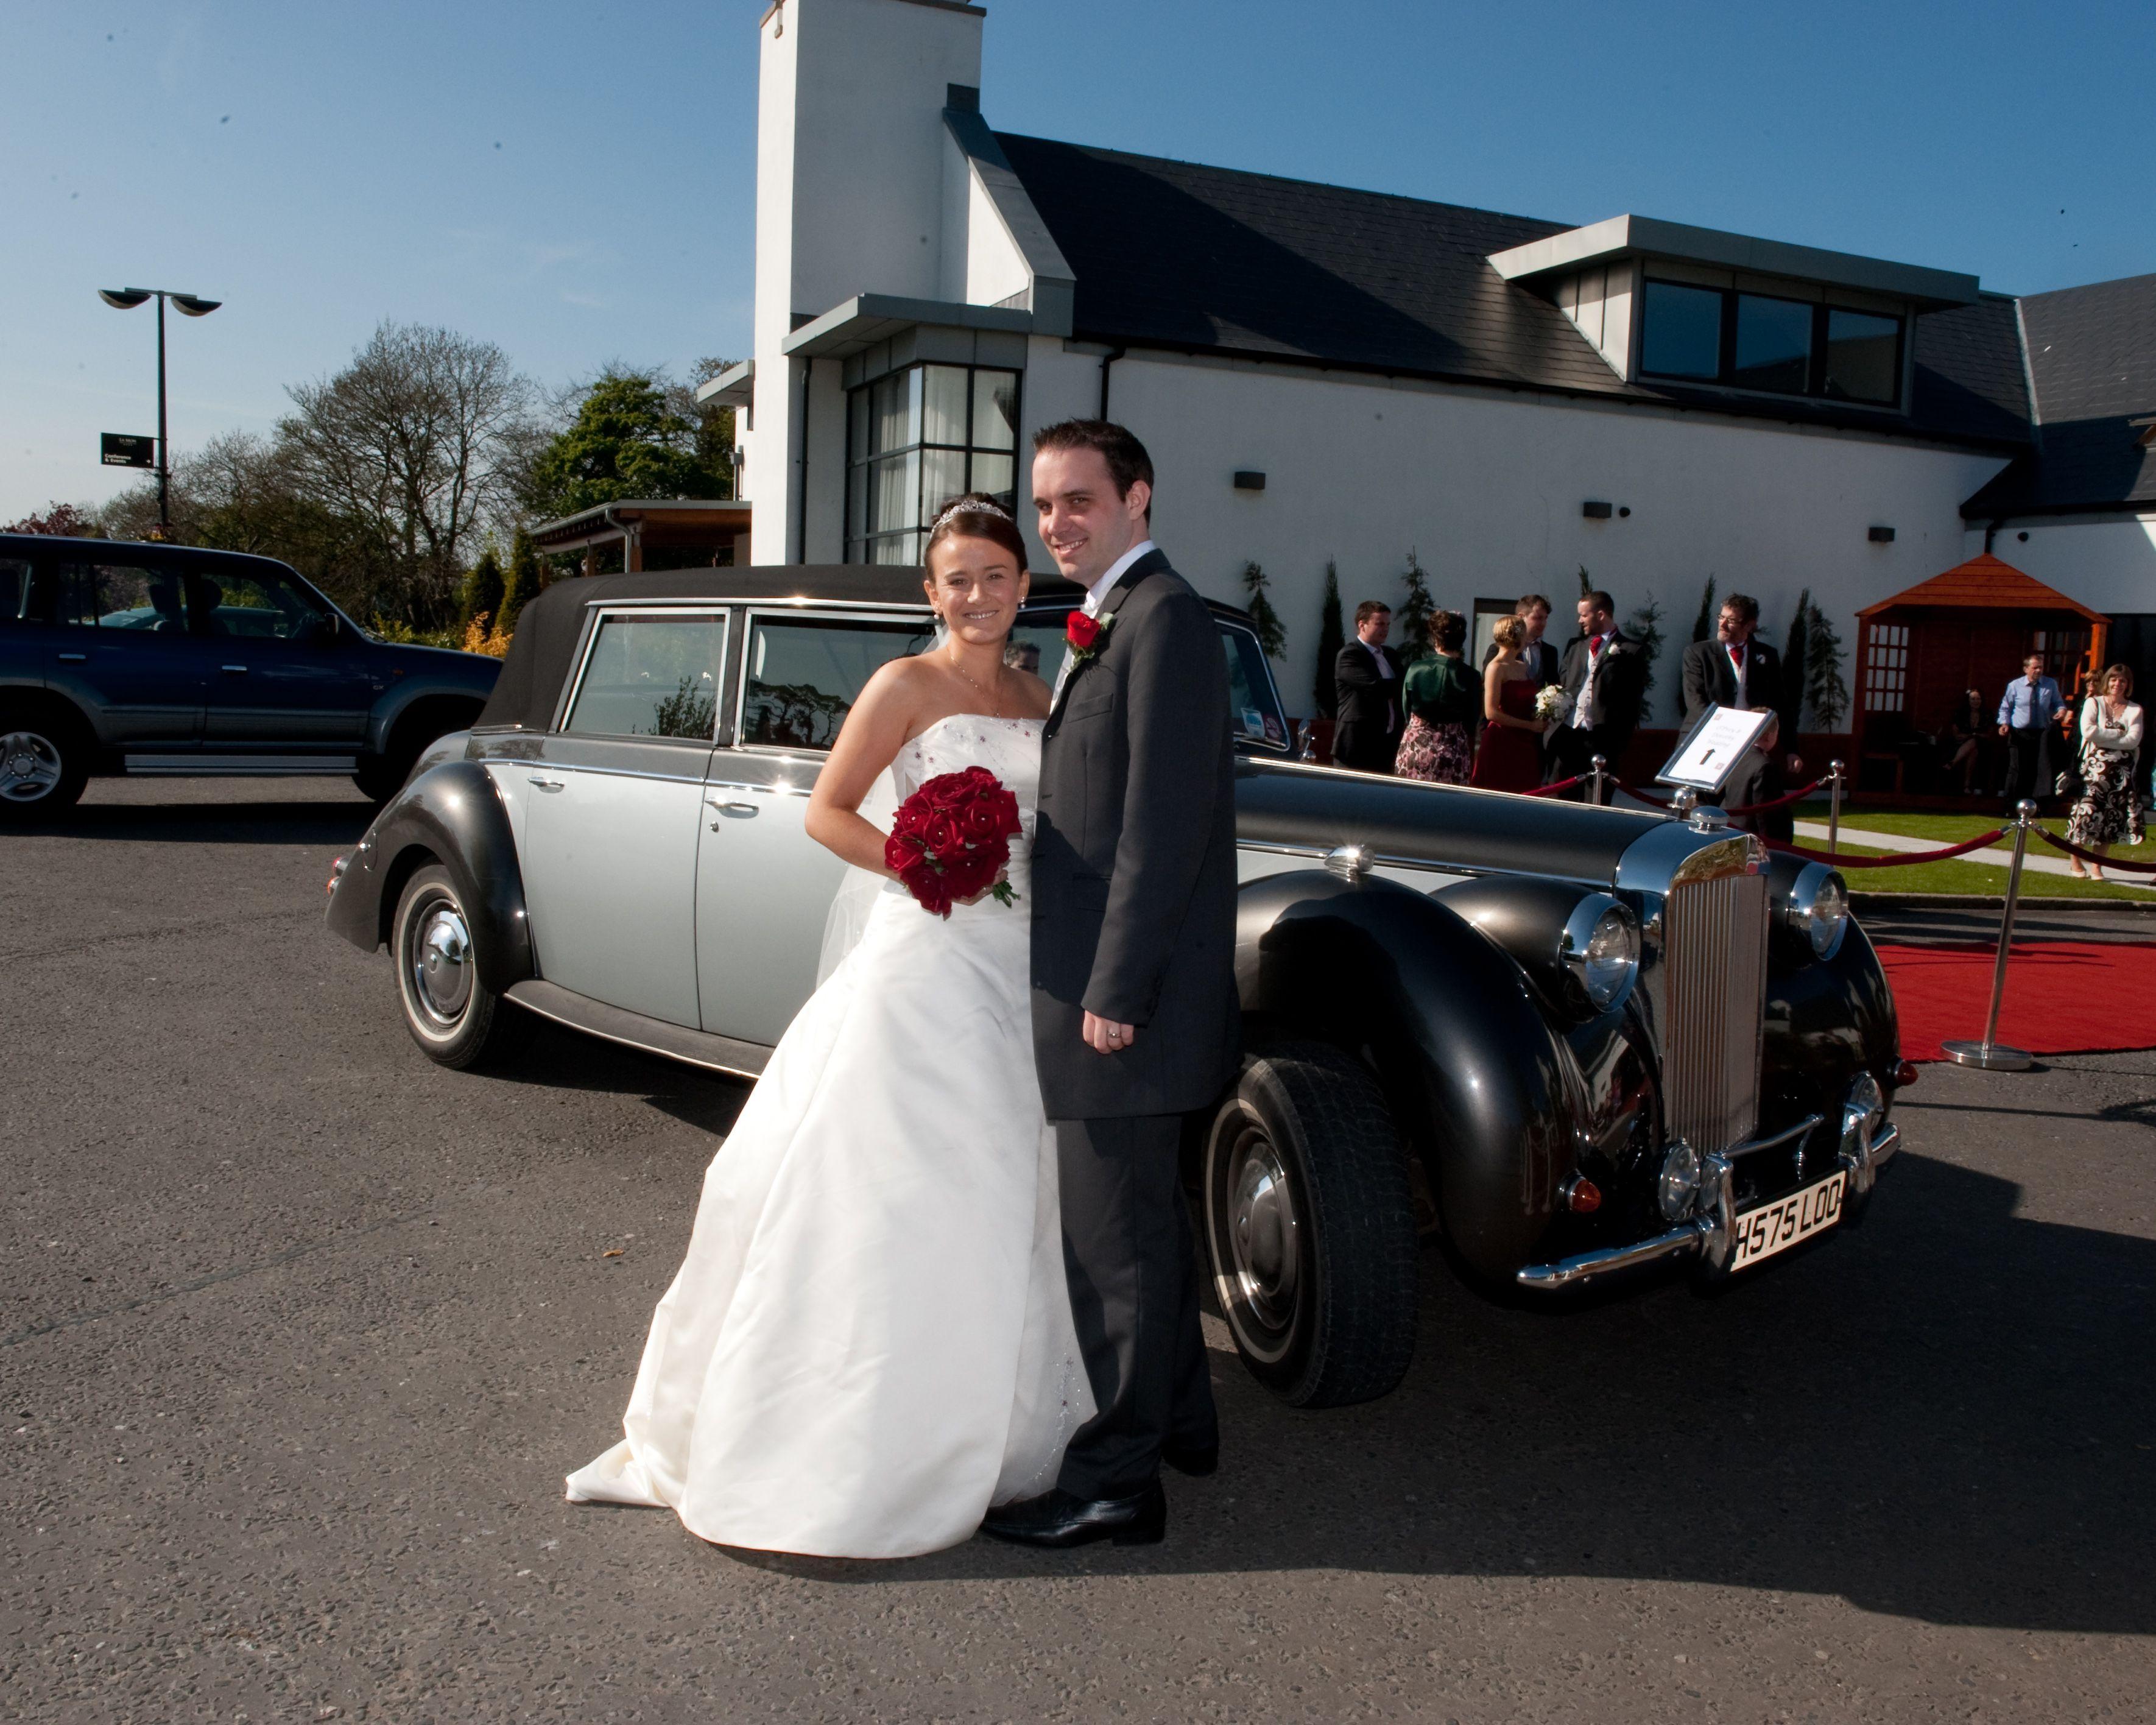 David Andrews Wedding Cars Belfast Silver Grey Windsor At La Mon Hotel Www Davidandrewsweddingcars Com Wedding Car Belfast Wedding